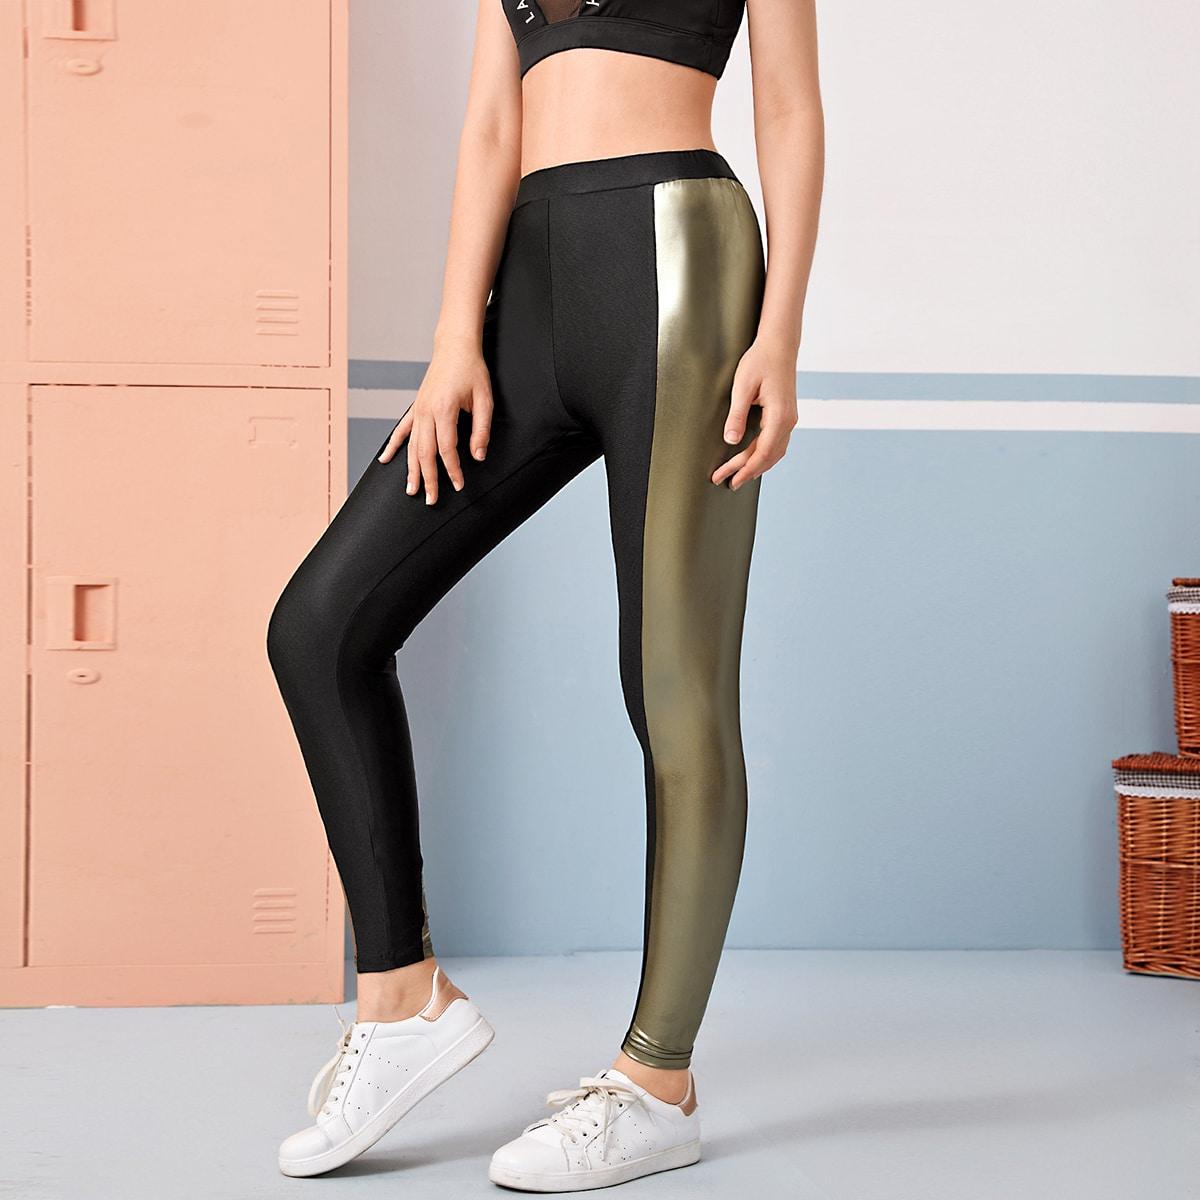 SHEIN / Leggings de cintura elástica